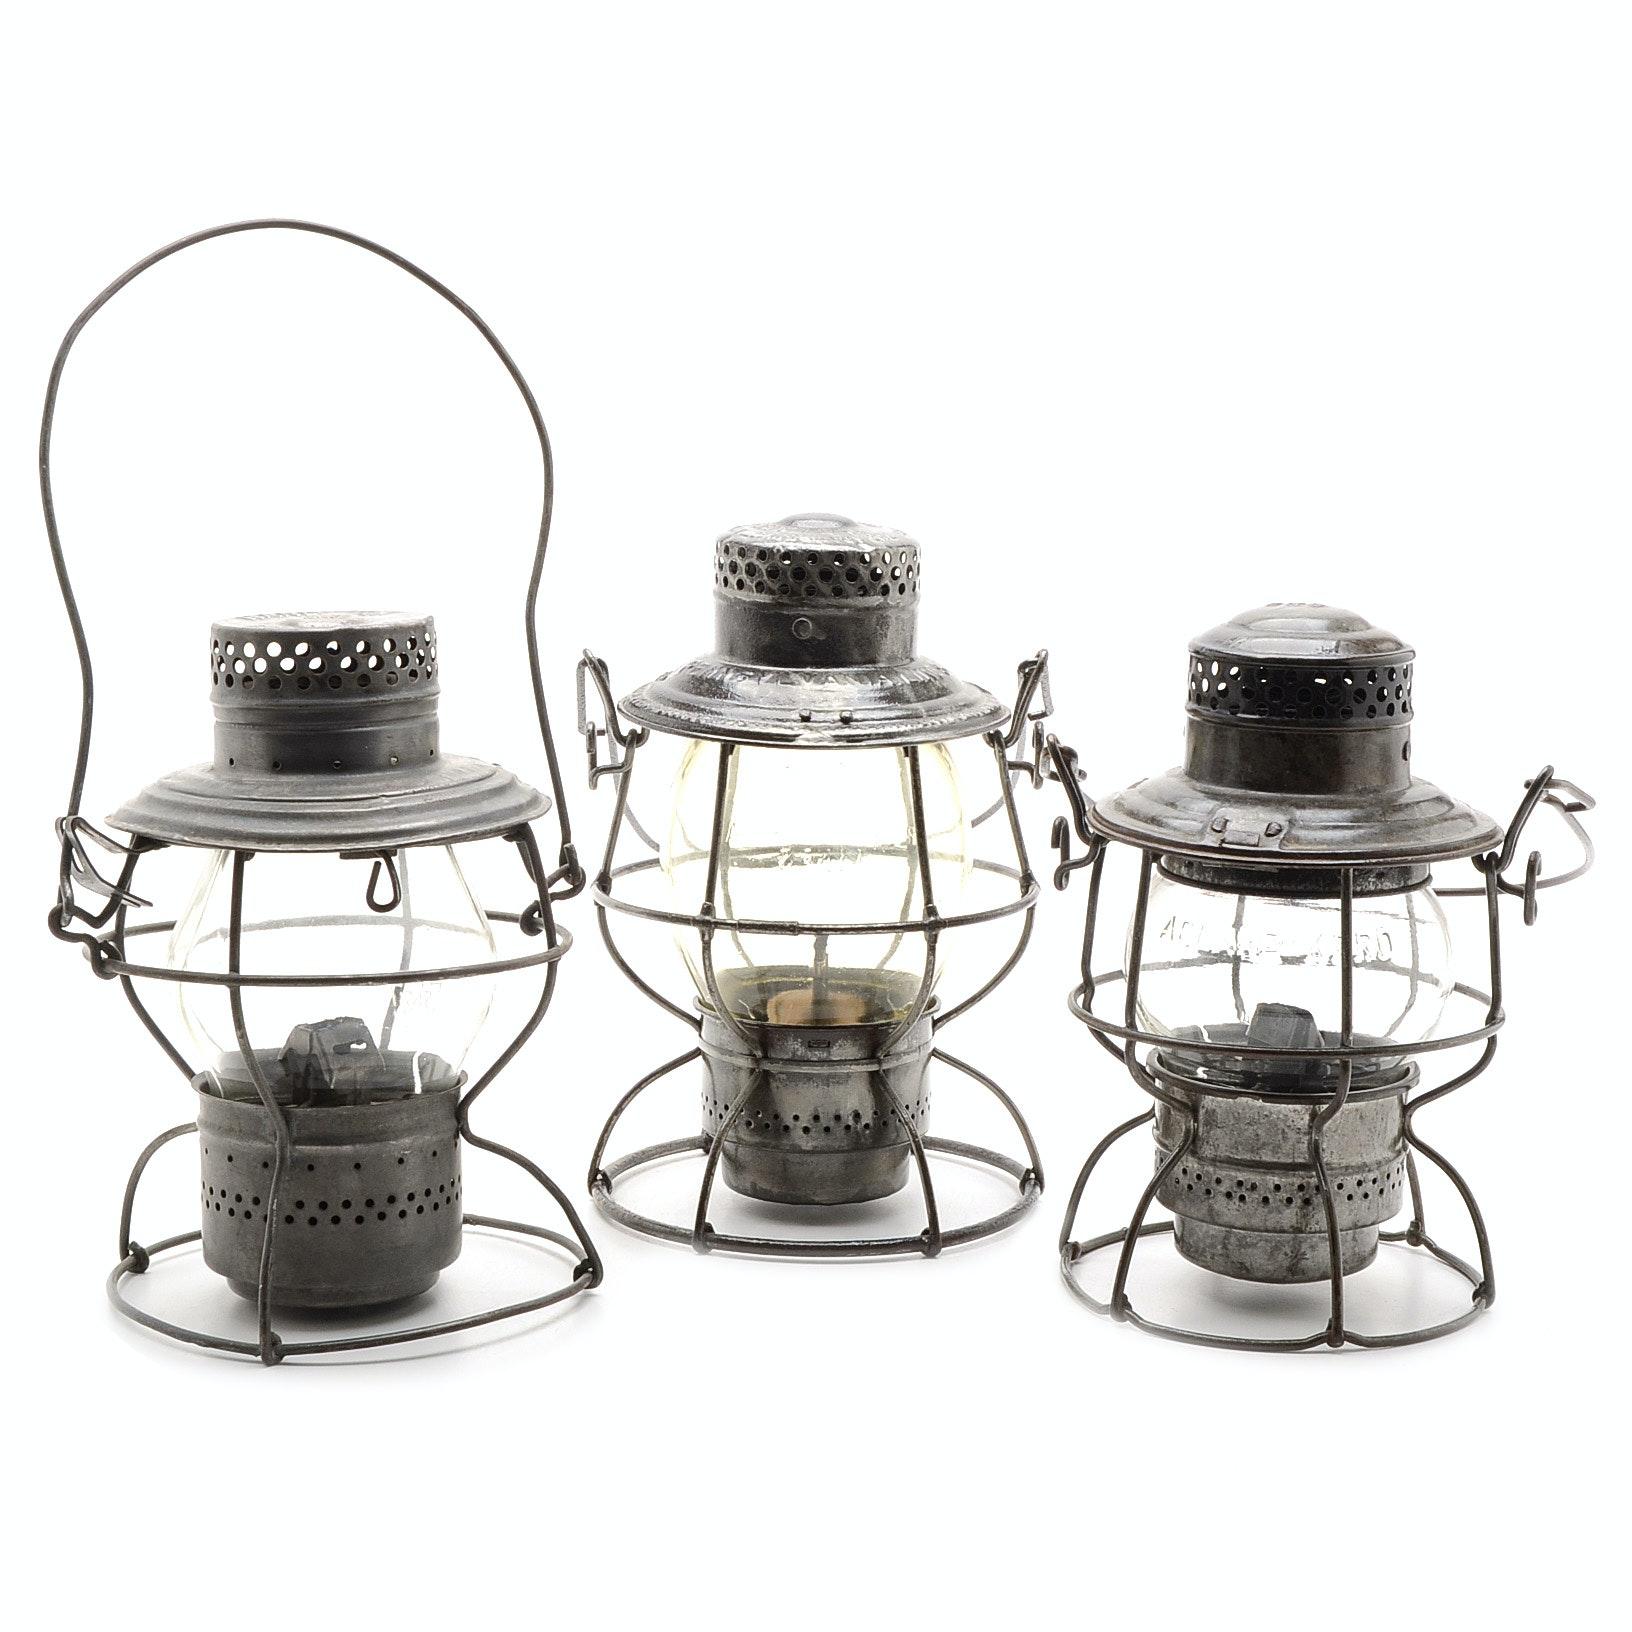 Collection of Vintage Railway Lanterns